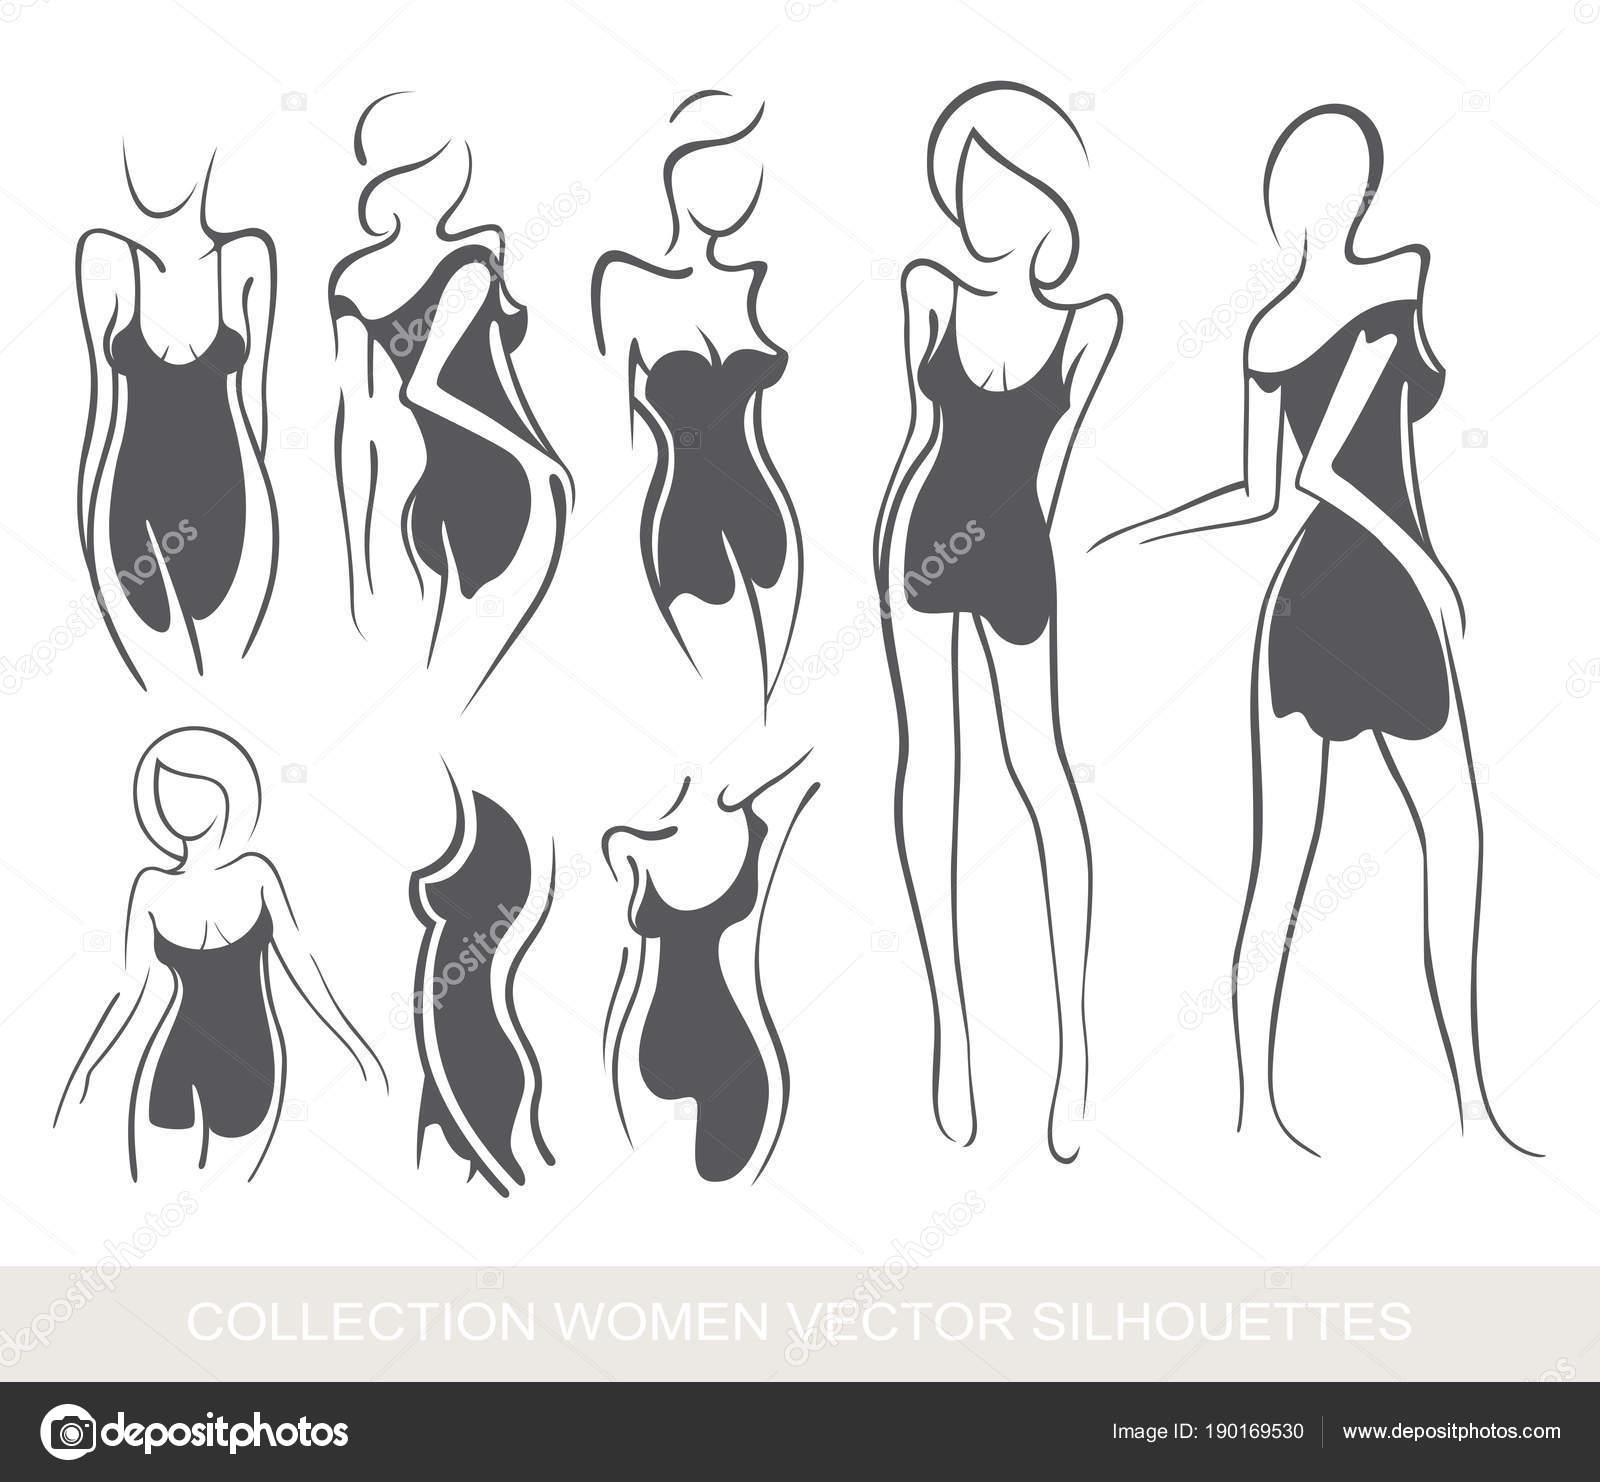 Obrázky nahých dívek zadek